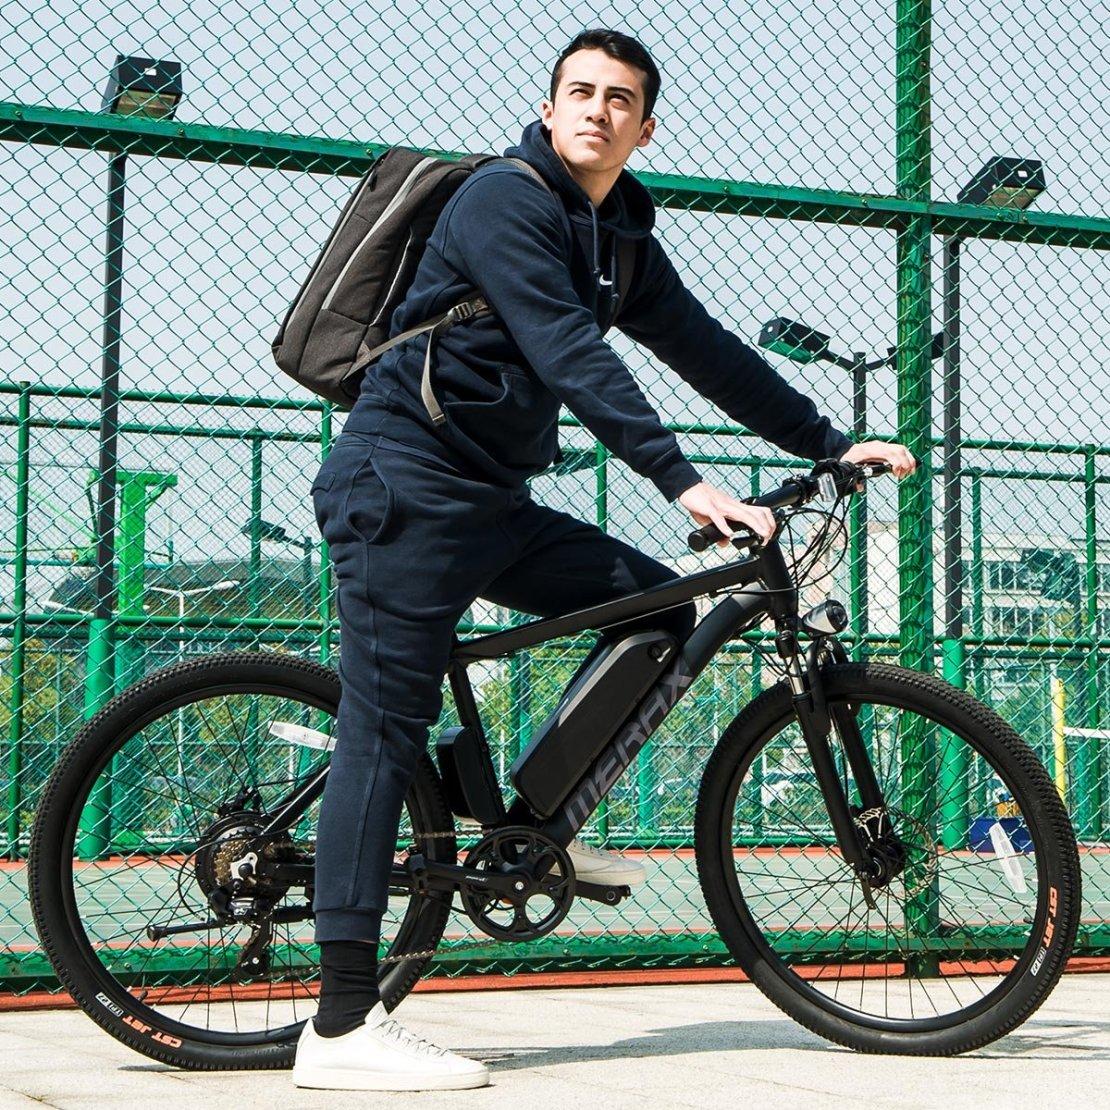 91uVMl8%2BjpL. SL1200  - 10 Best Electric Bikes 2019